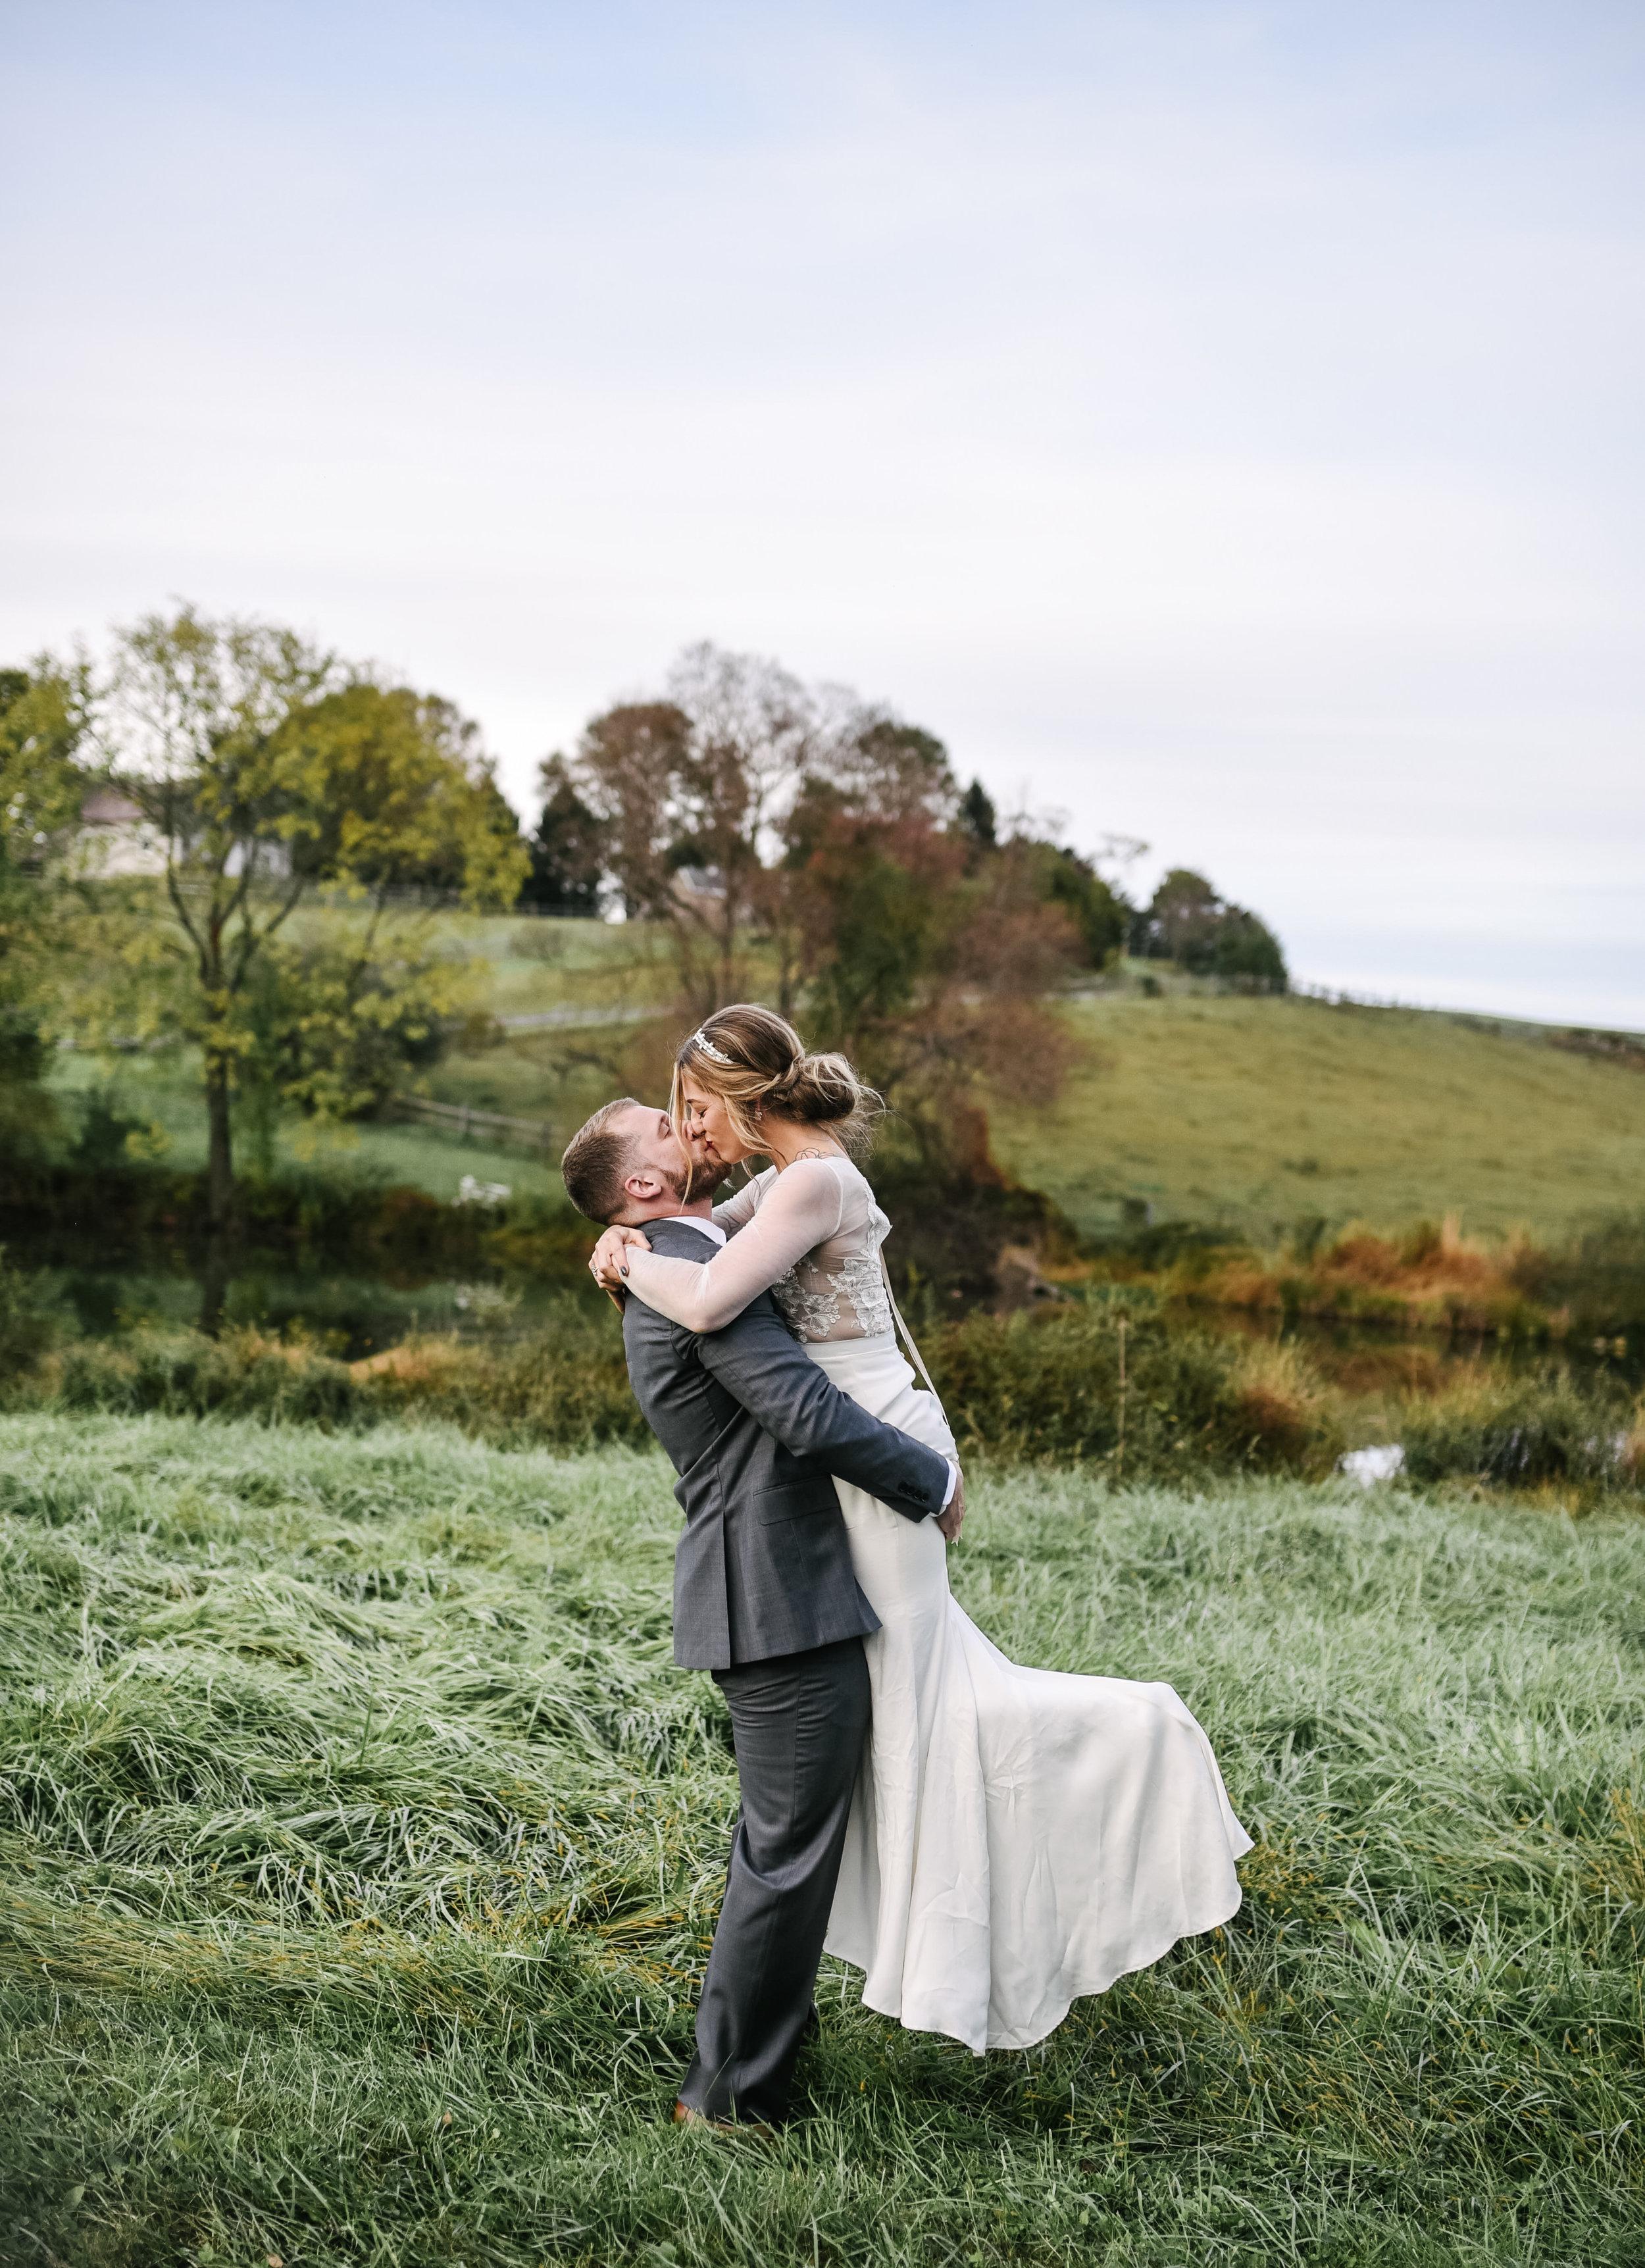 agpcollective_korn_coupleportraits-0645.jpg